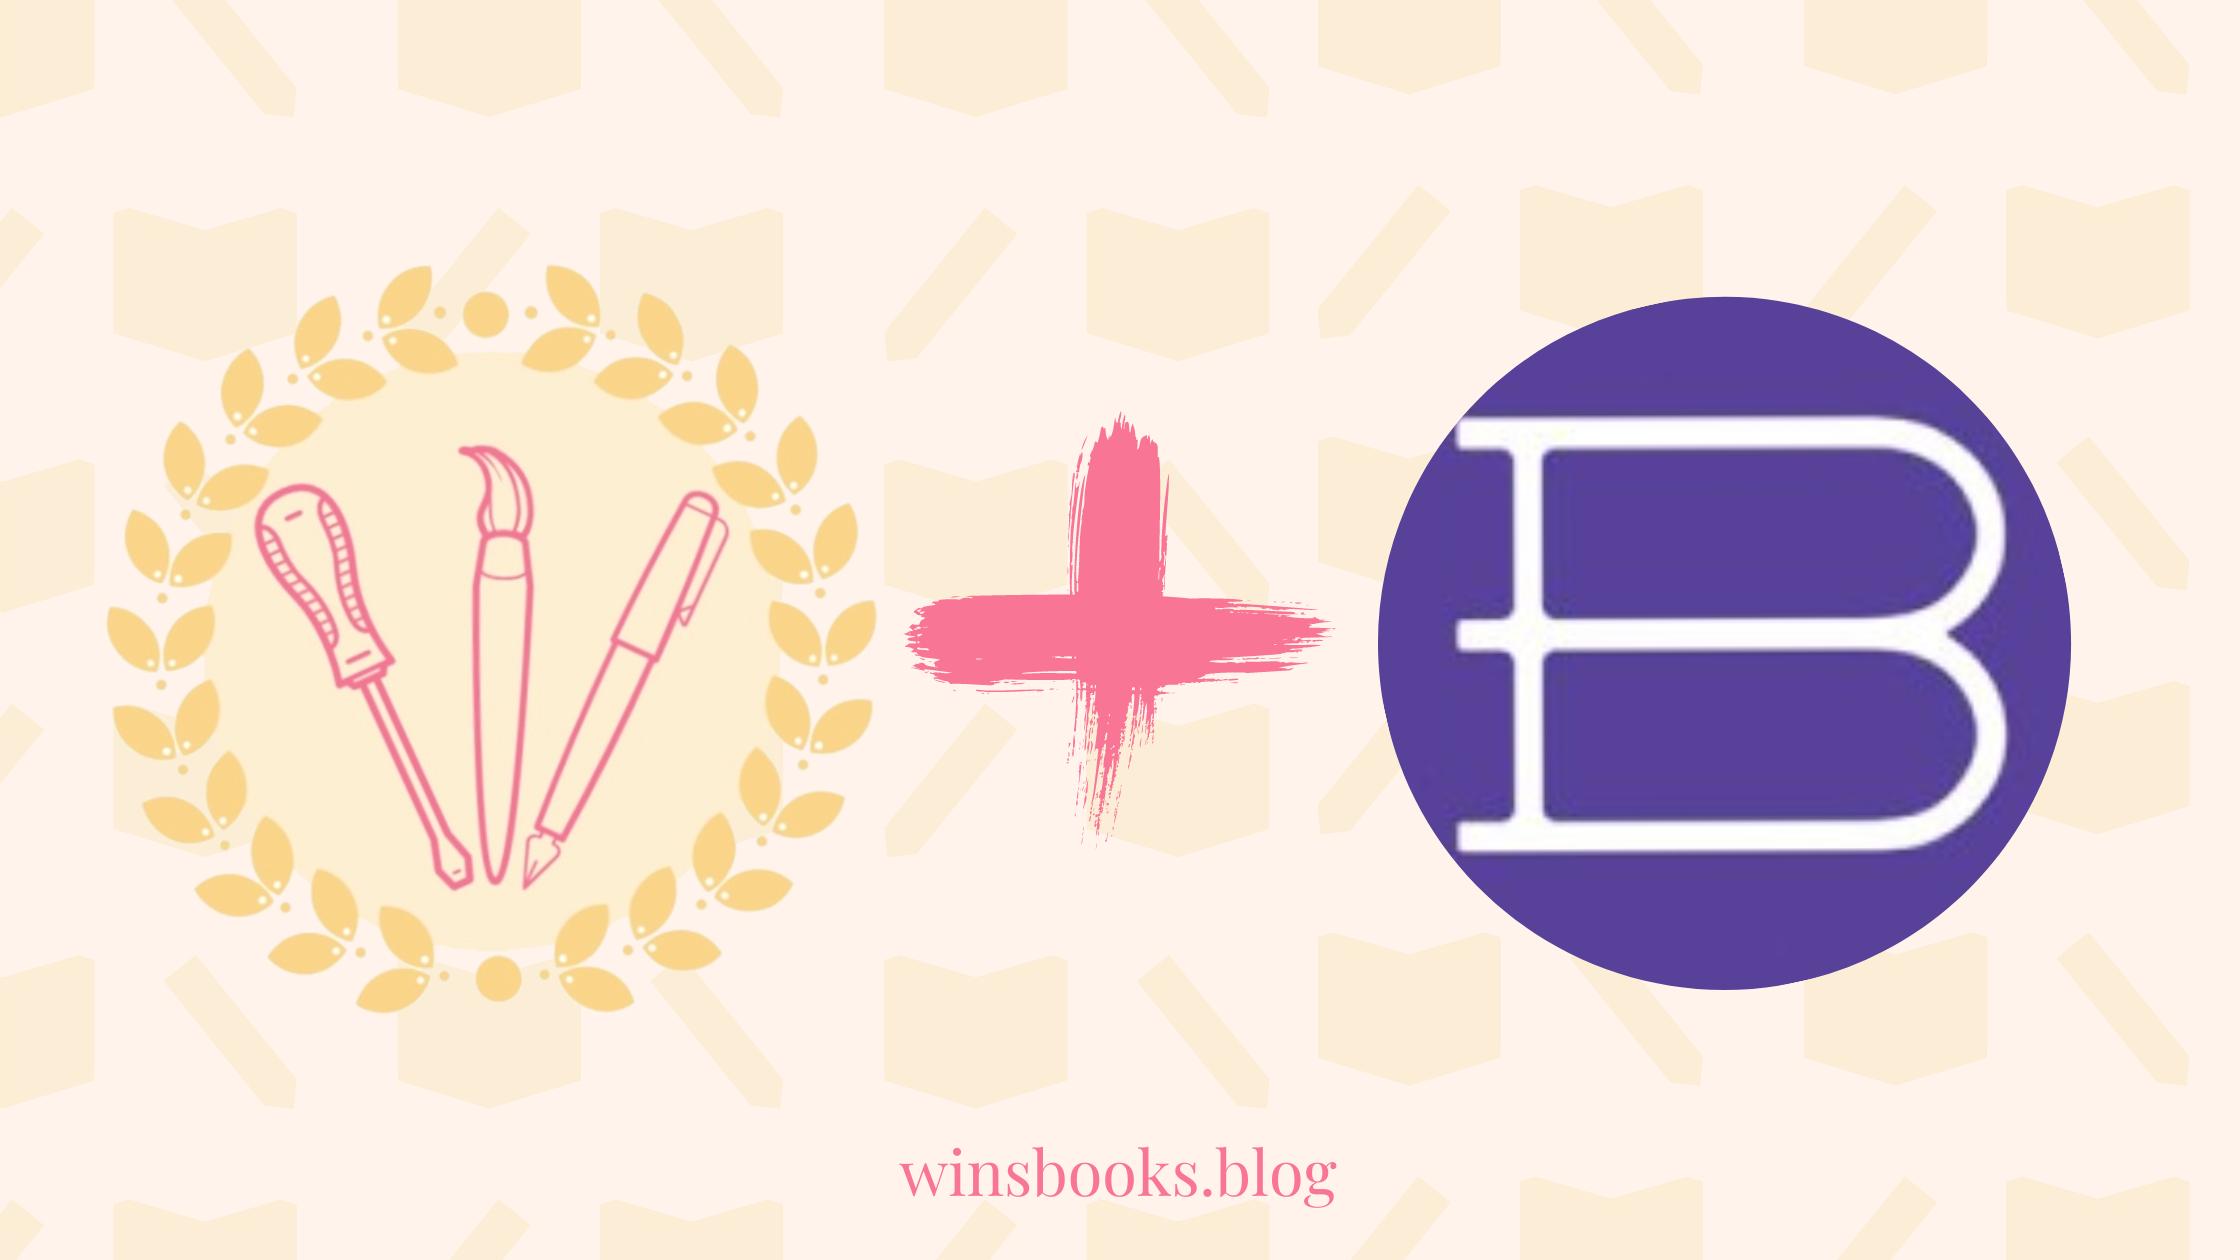 winsbooks logo and bookshop.org logo